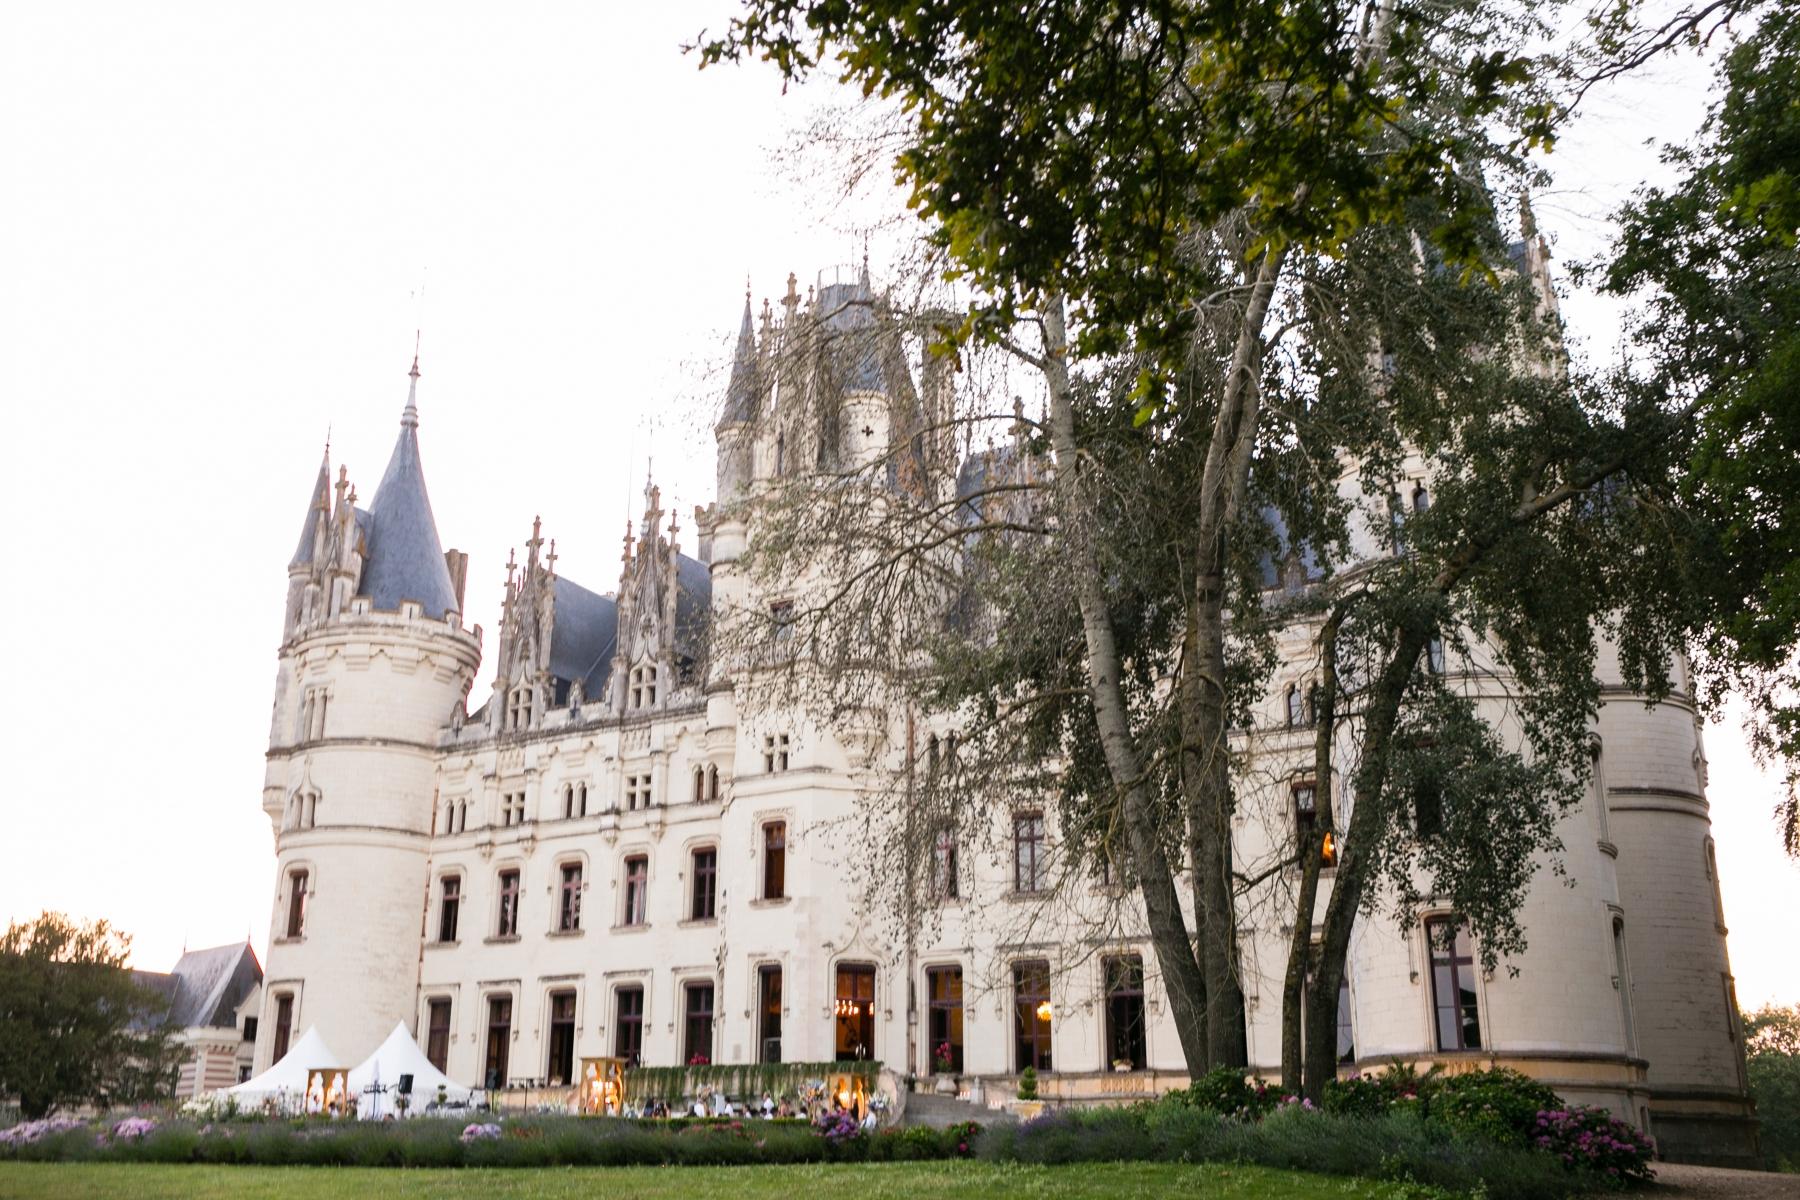 Chateau Challain - Belle Bridal Venue Guest List - Kevin Chin Photography & Cinema